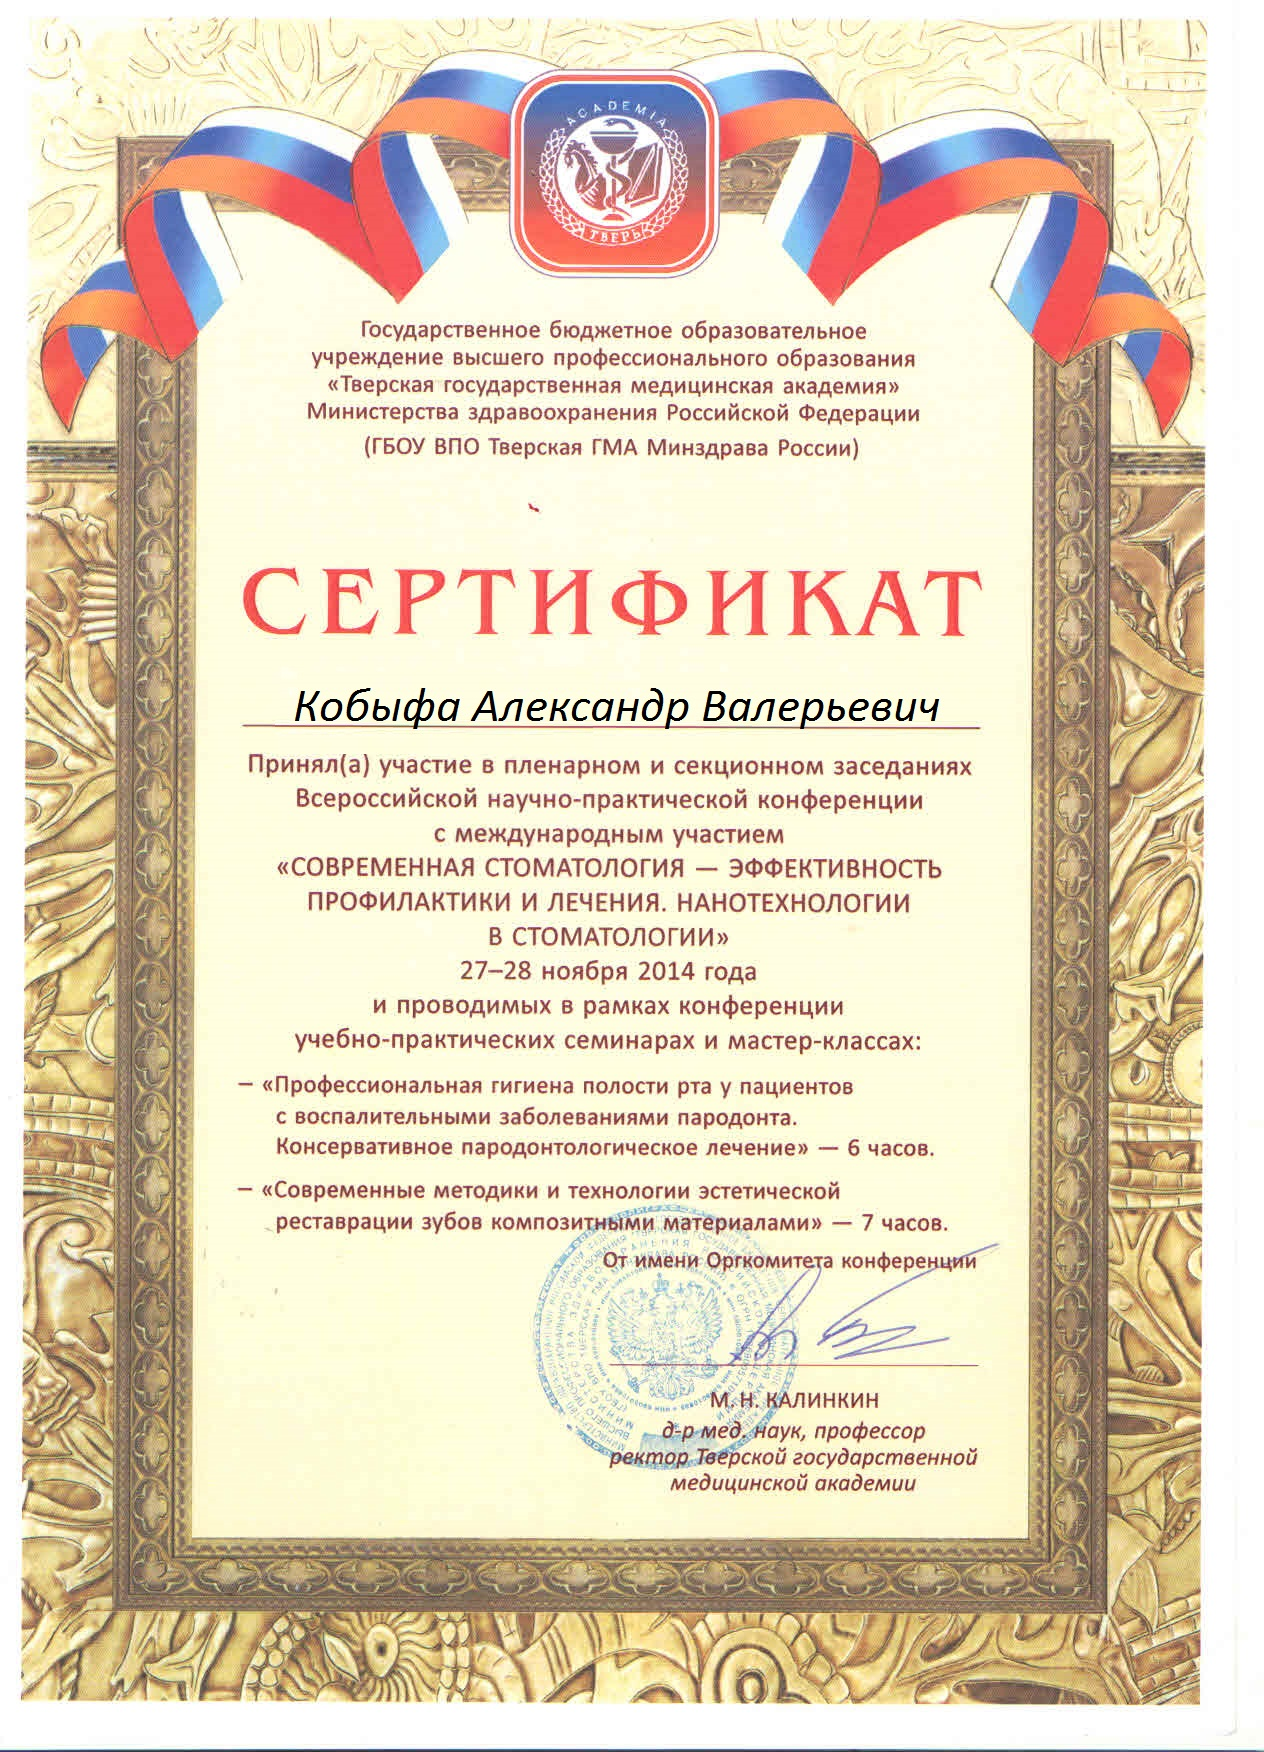 Сертификат 7.